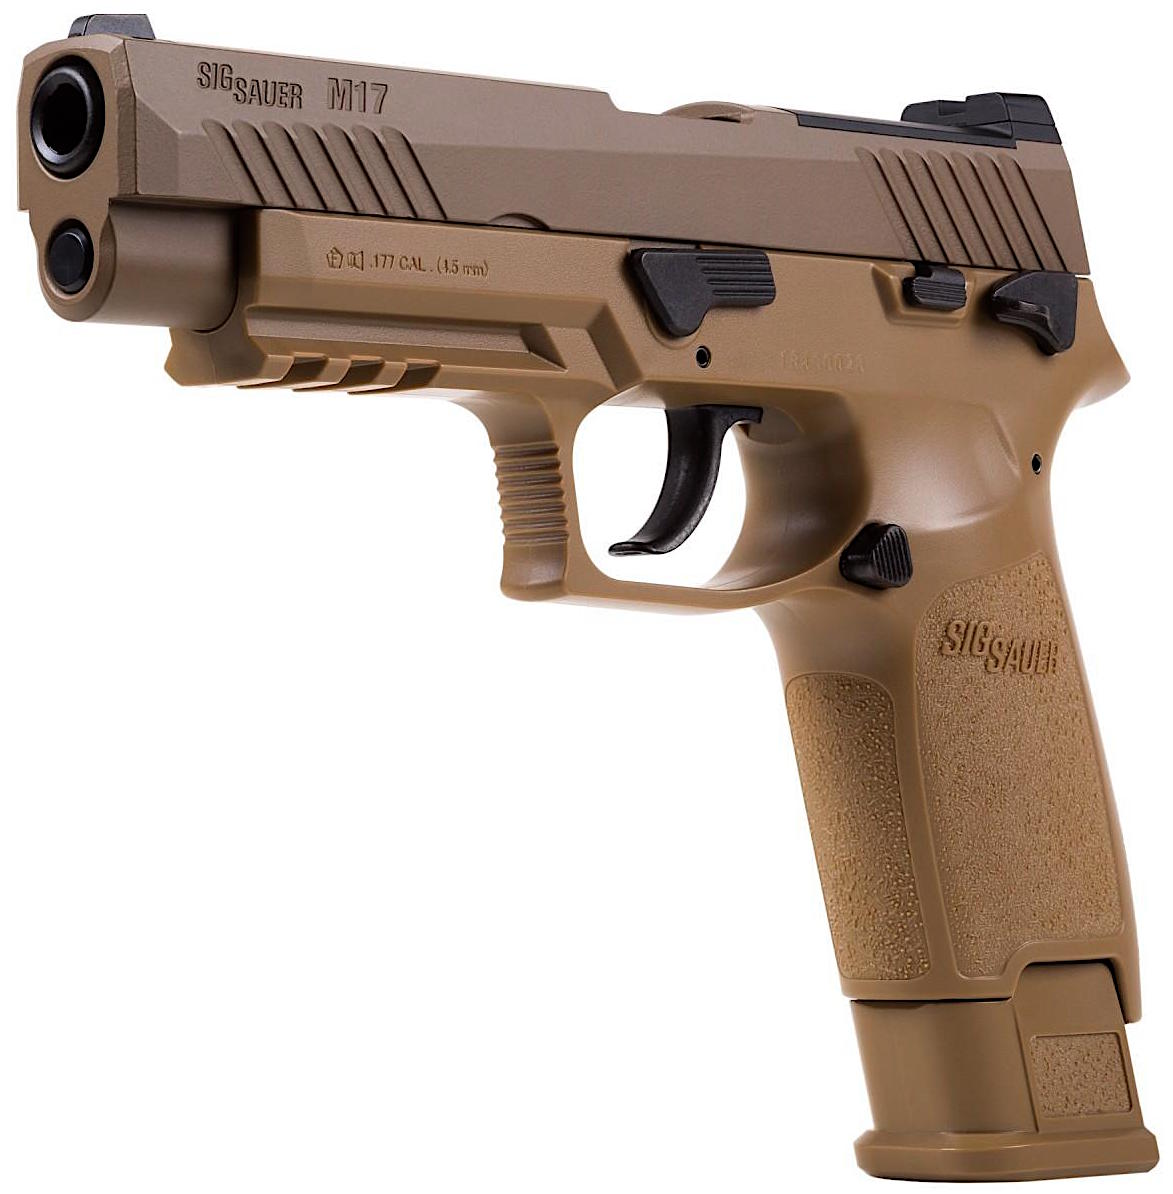 SIG Sauer M17 Blowback Pellet Pistol.jpg